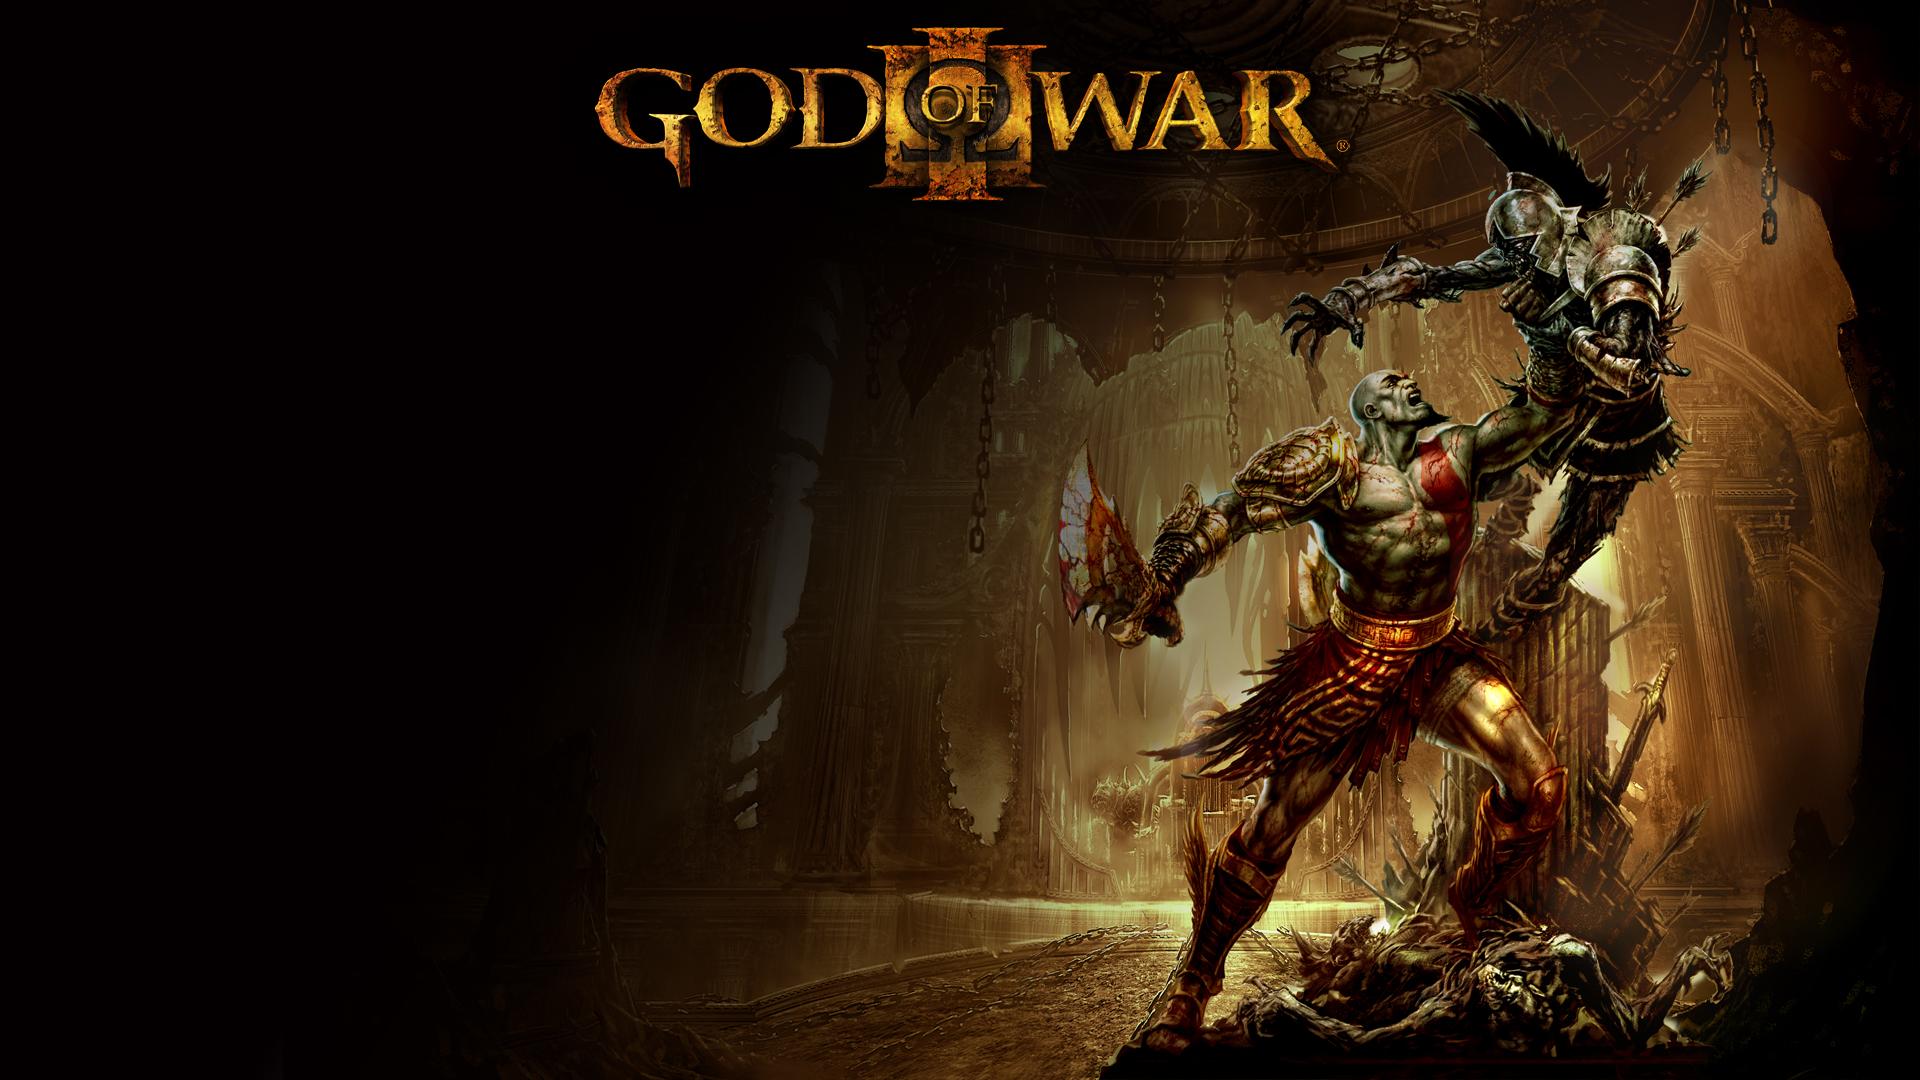 48 God Of War 4k Wallpaper On Wallpapersafari